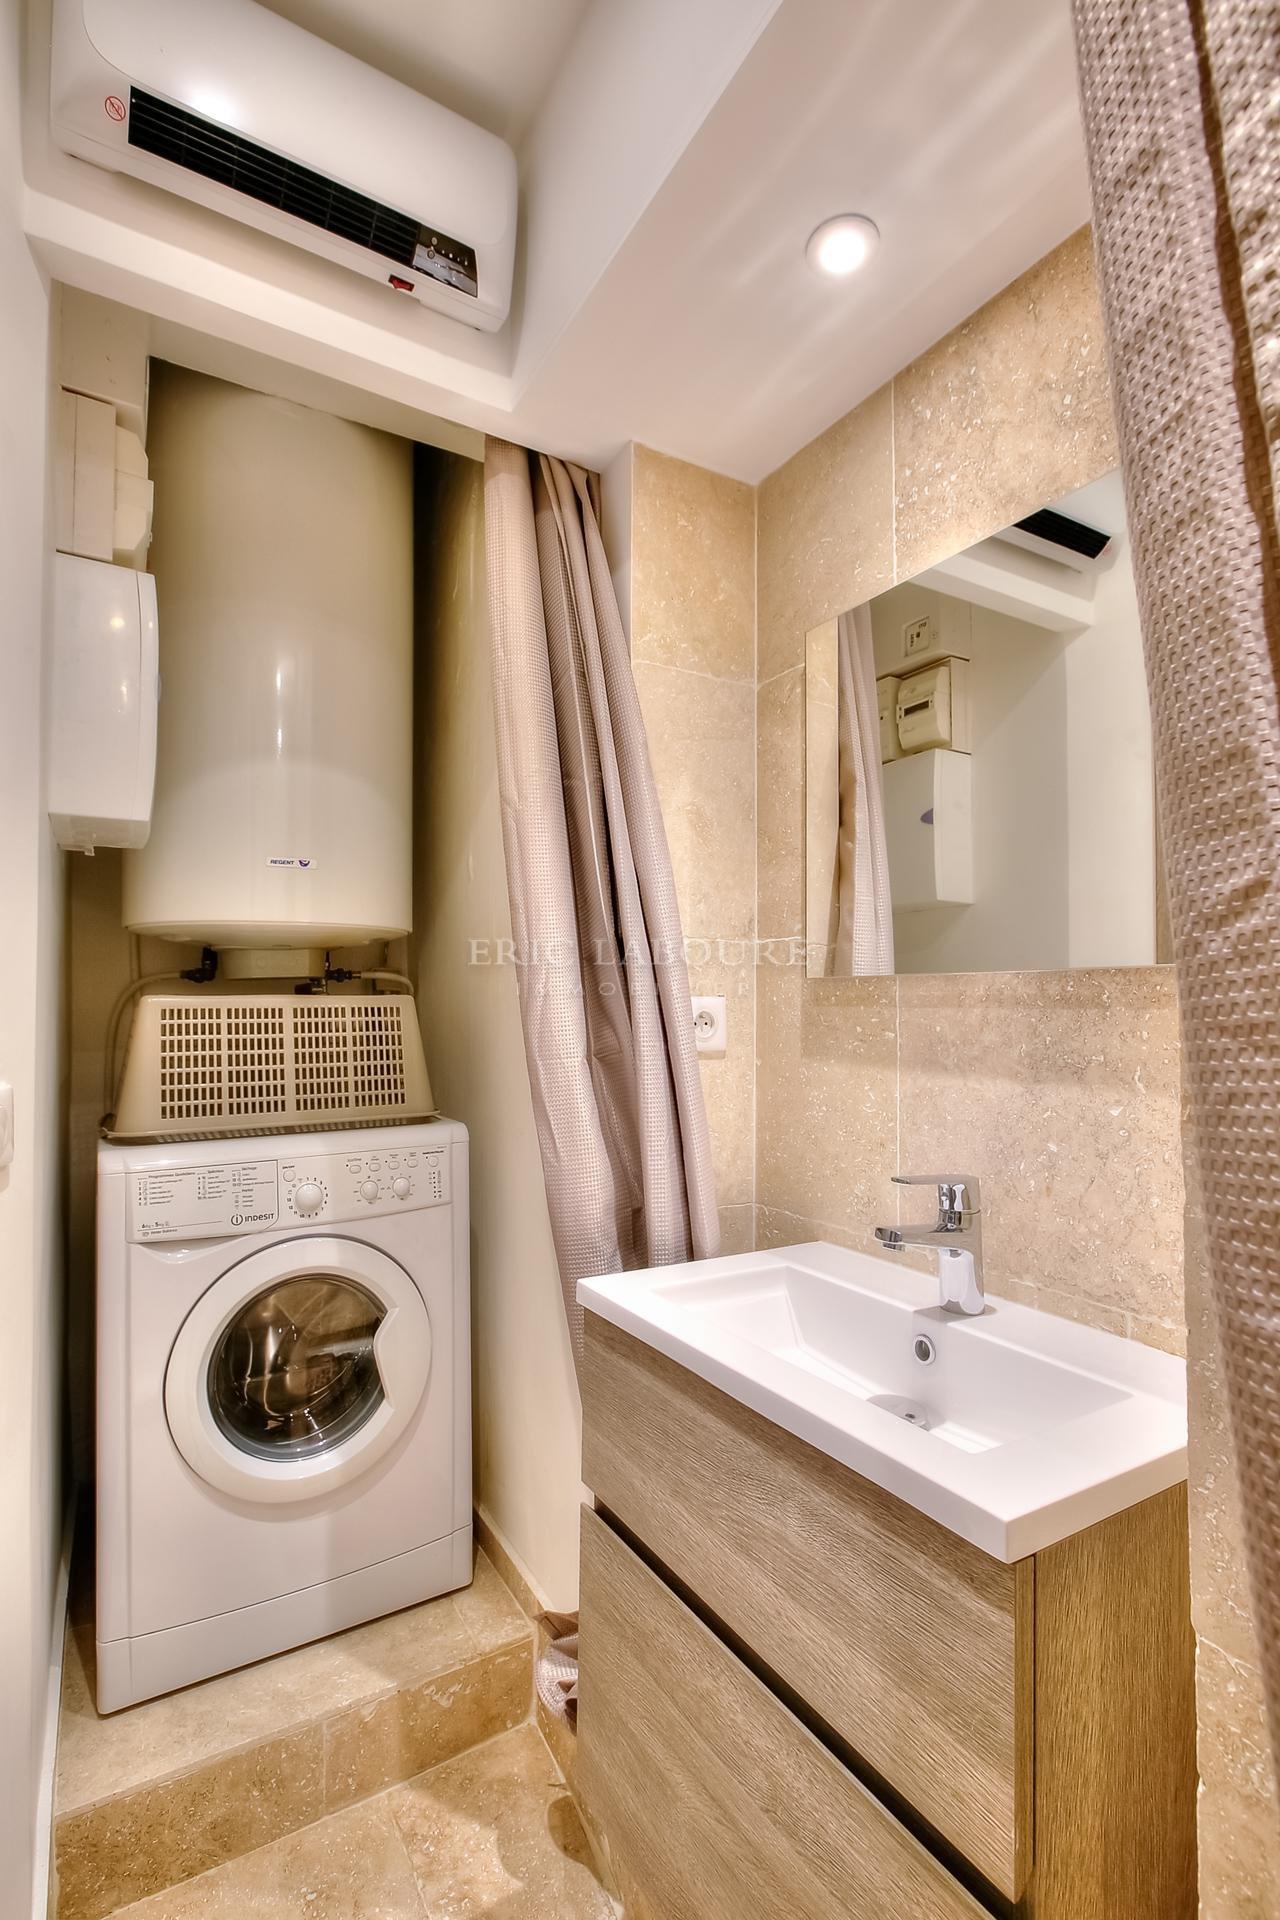 Vente appartement 3p Cannes Banane - Investissement locatif